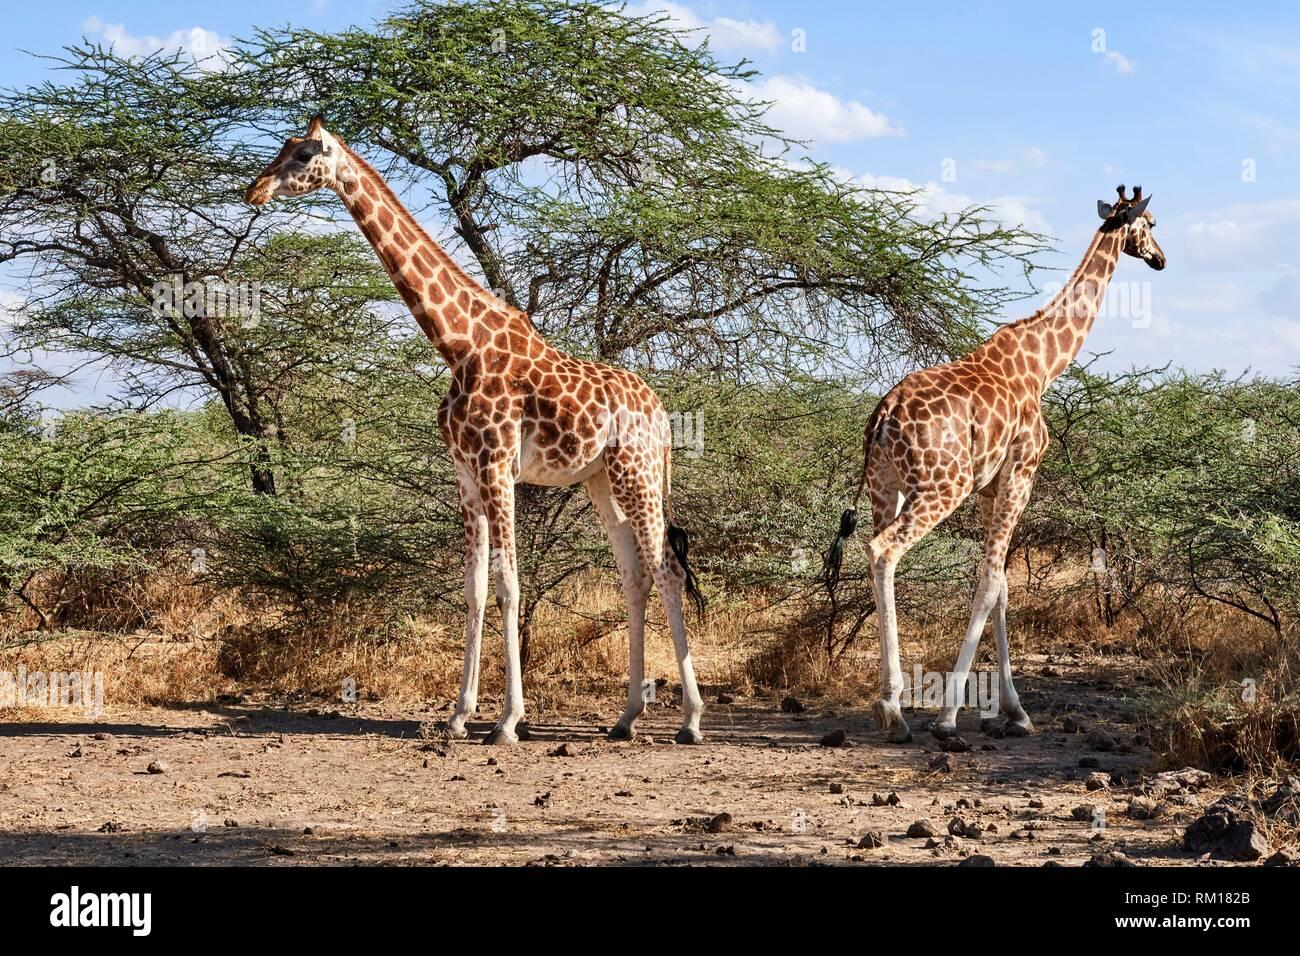 Rothschild giraffe (Giraffa camelopardalis rothschildi) Ruko Conservancy island, Lake Baringo, Kenya, Africa. Stock Photo